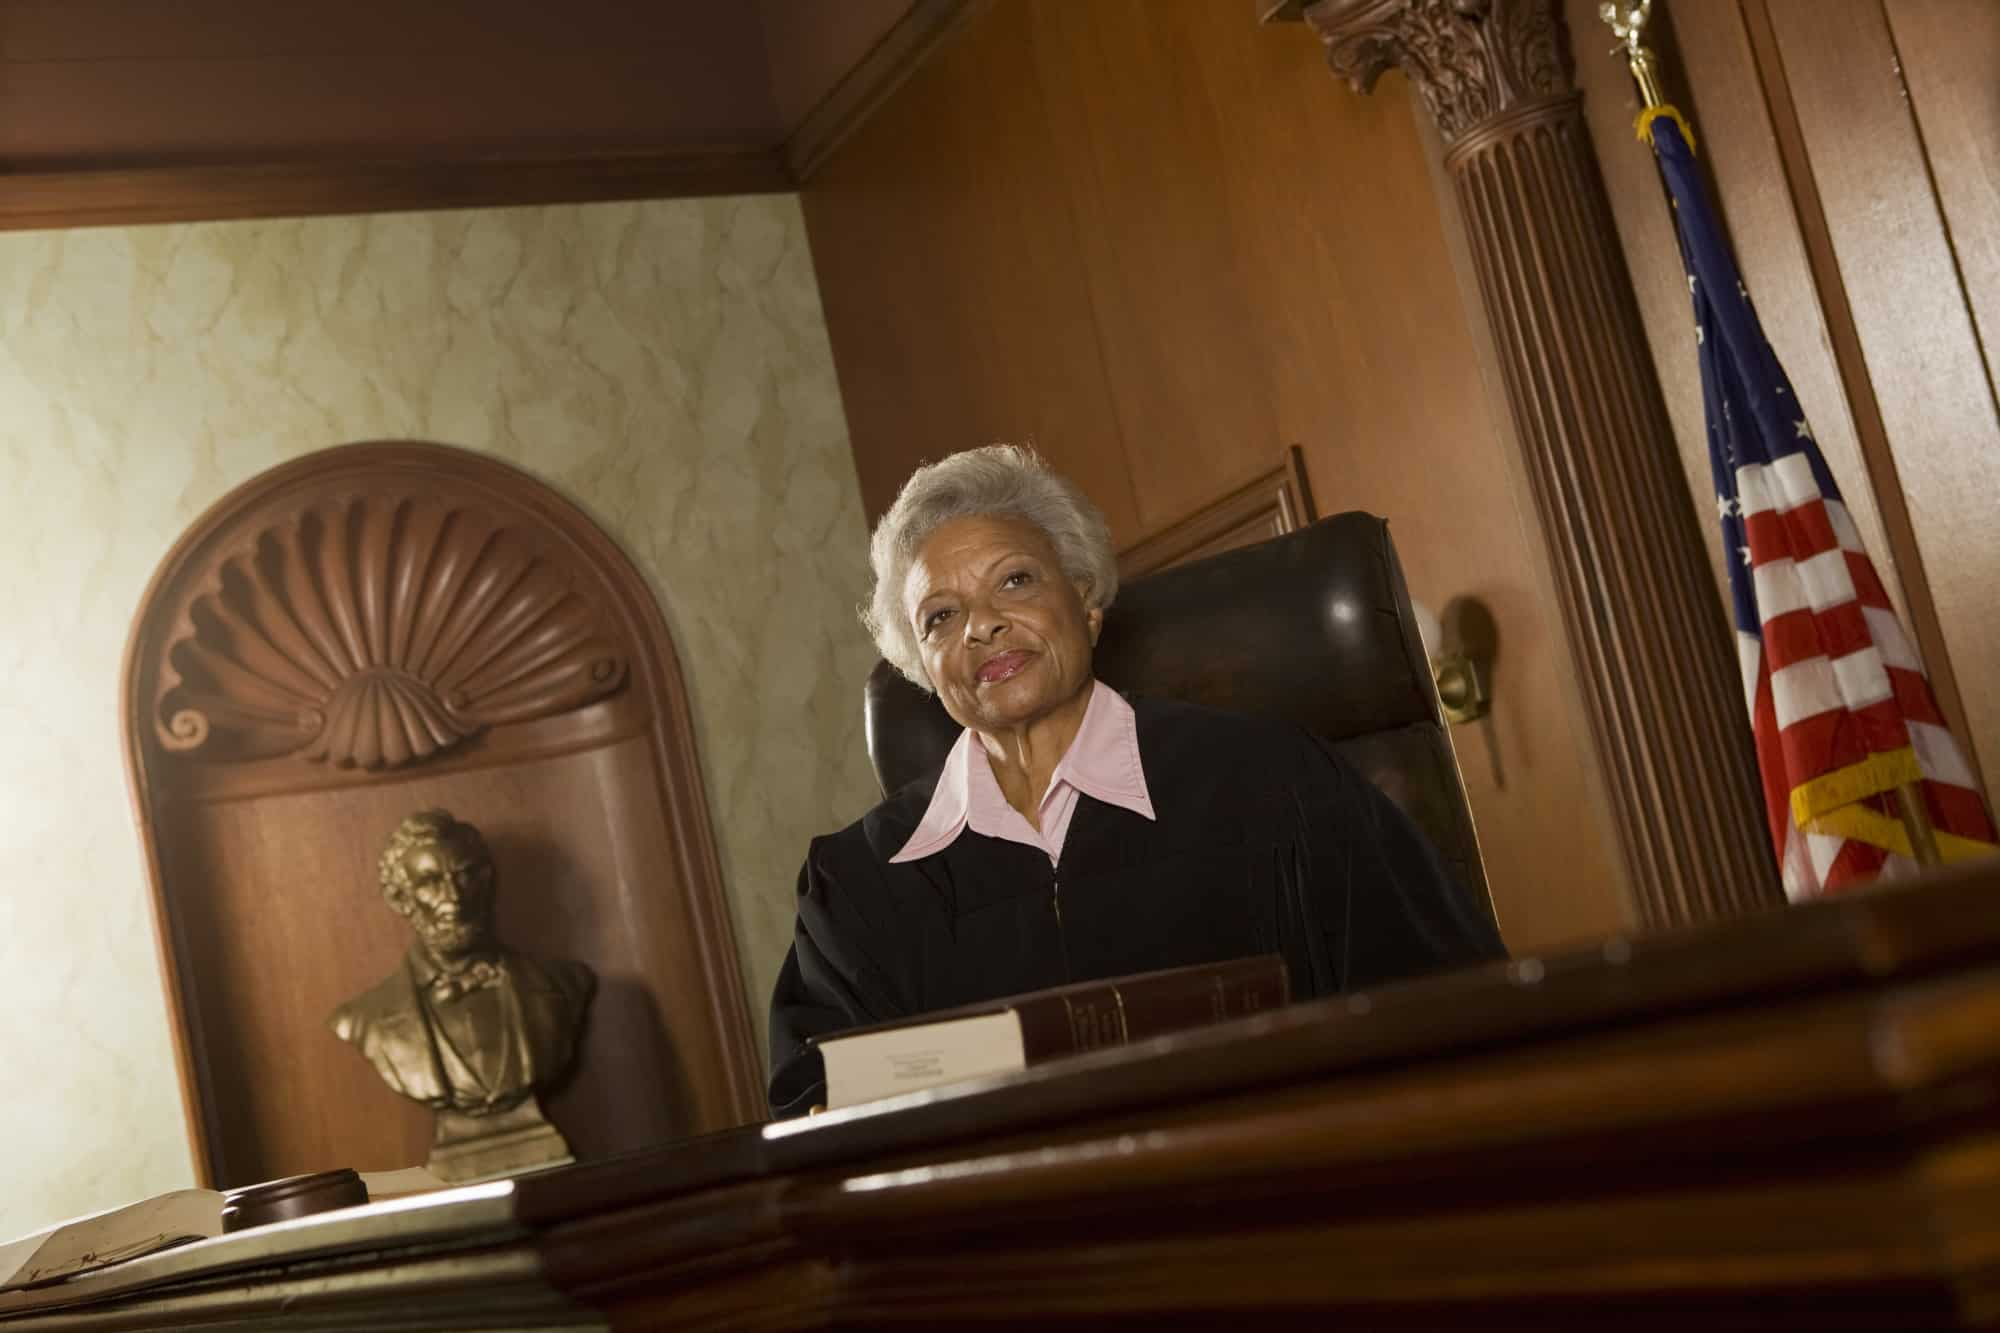 Black female judge presiding over a civil case due to DIY legal contracts.